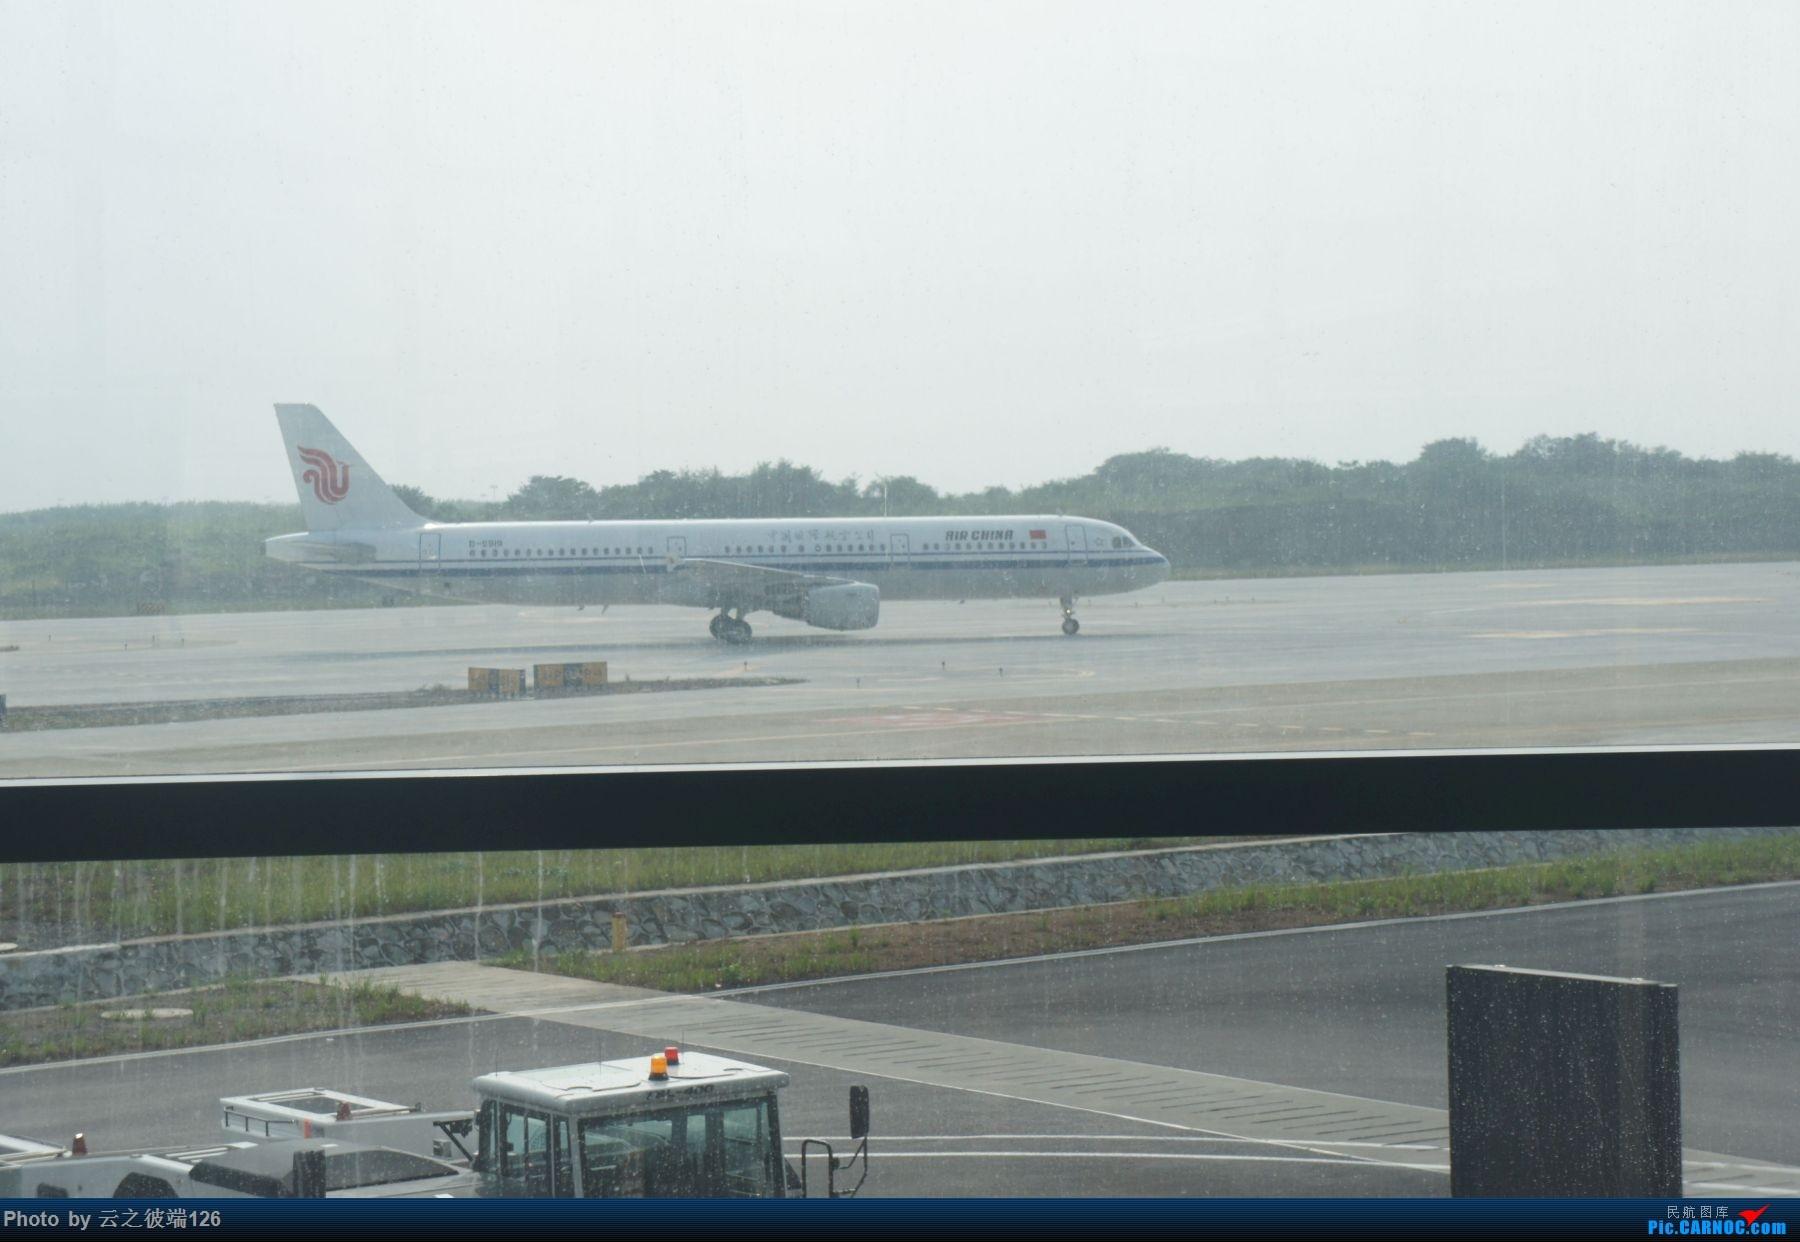 Re:[原创]迟到两年的游记 -----------NKG-SZX-NKG ZH+白菜航------ AIRBUS A321-200 B-9919 中国南京禄口国际机场